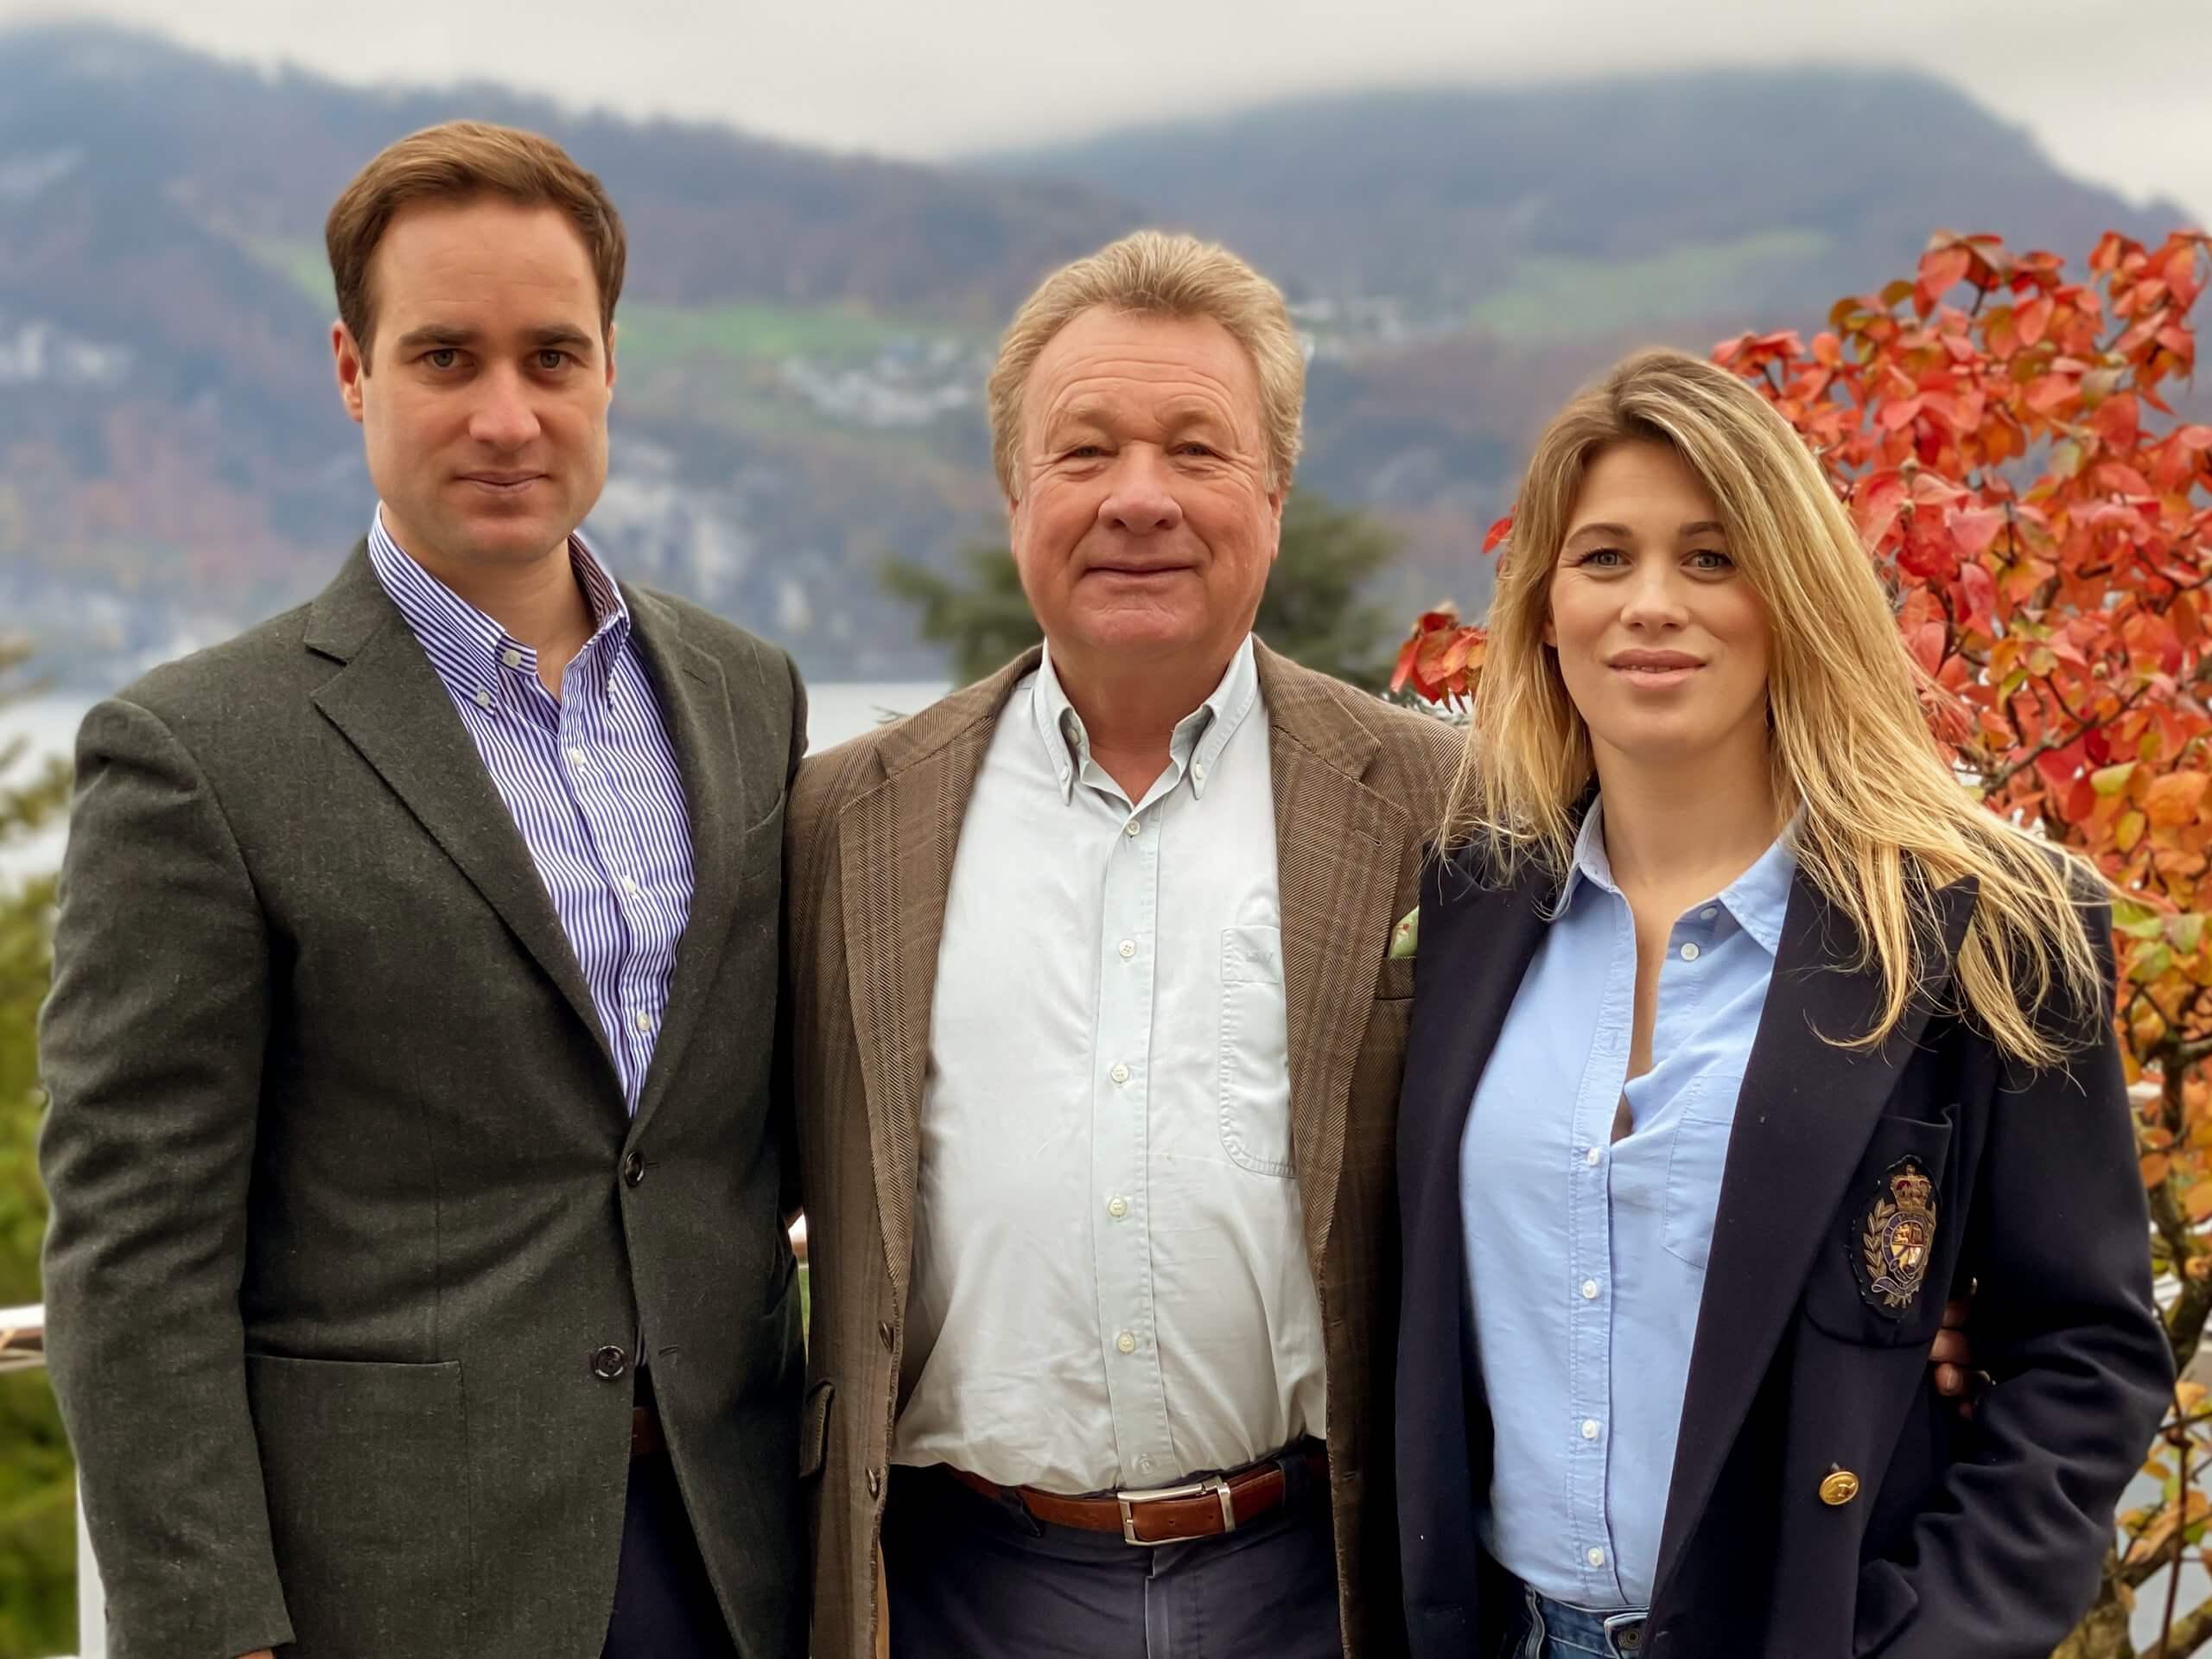 Saxenburg - Vincent, Adrian and Fiona Buhrer